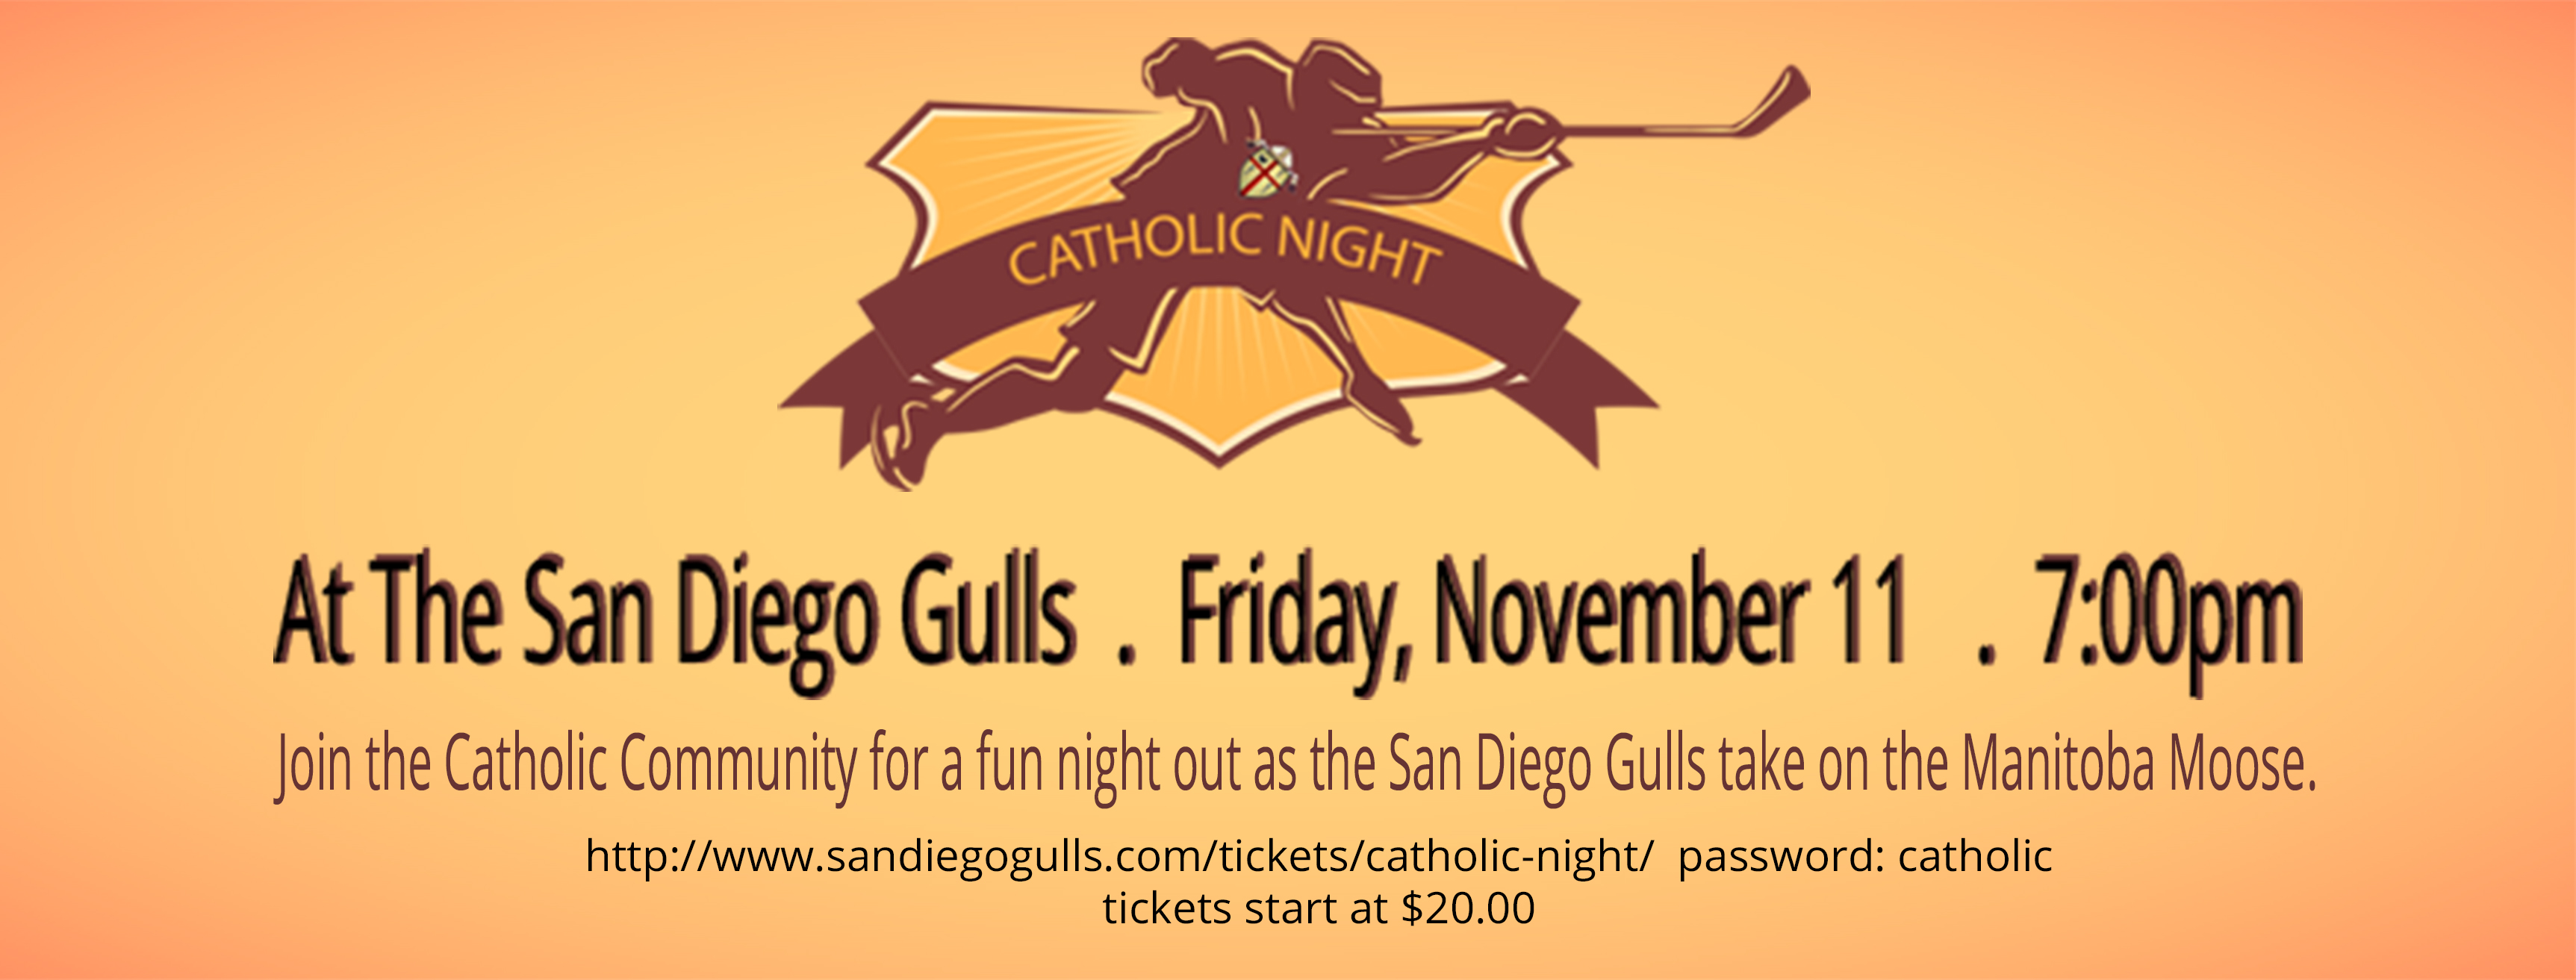 Catholic Night at the San Diego Gulls